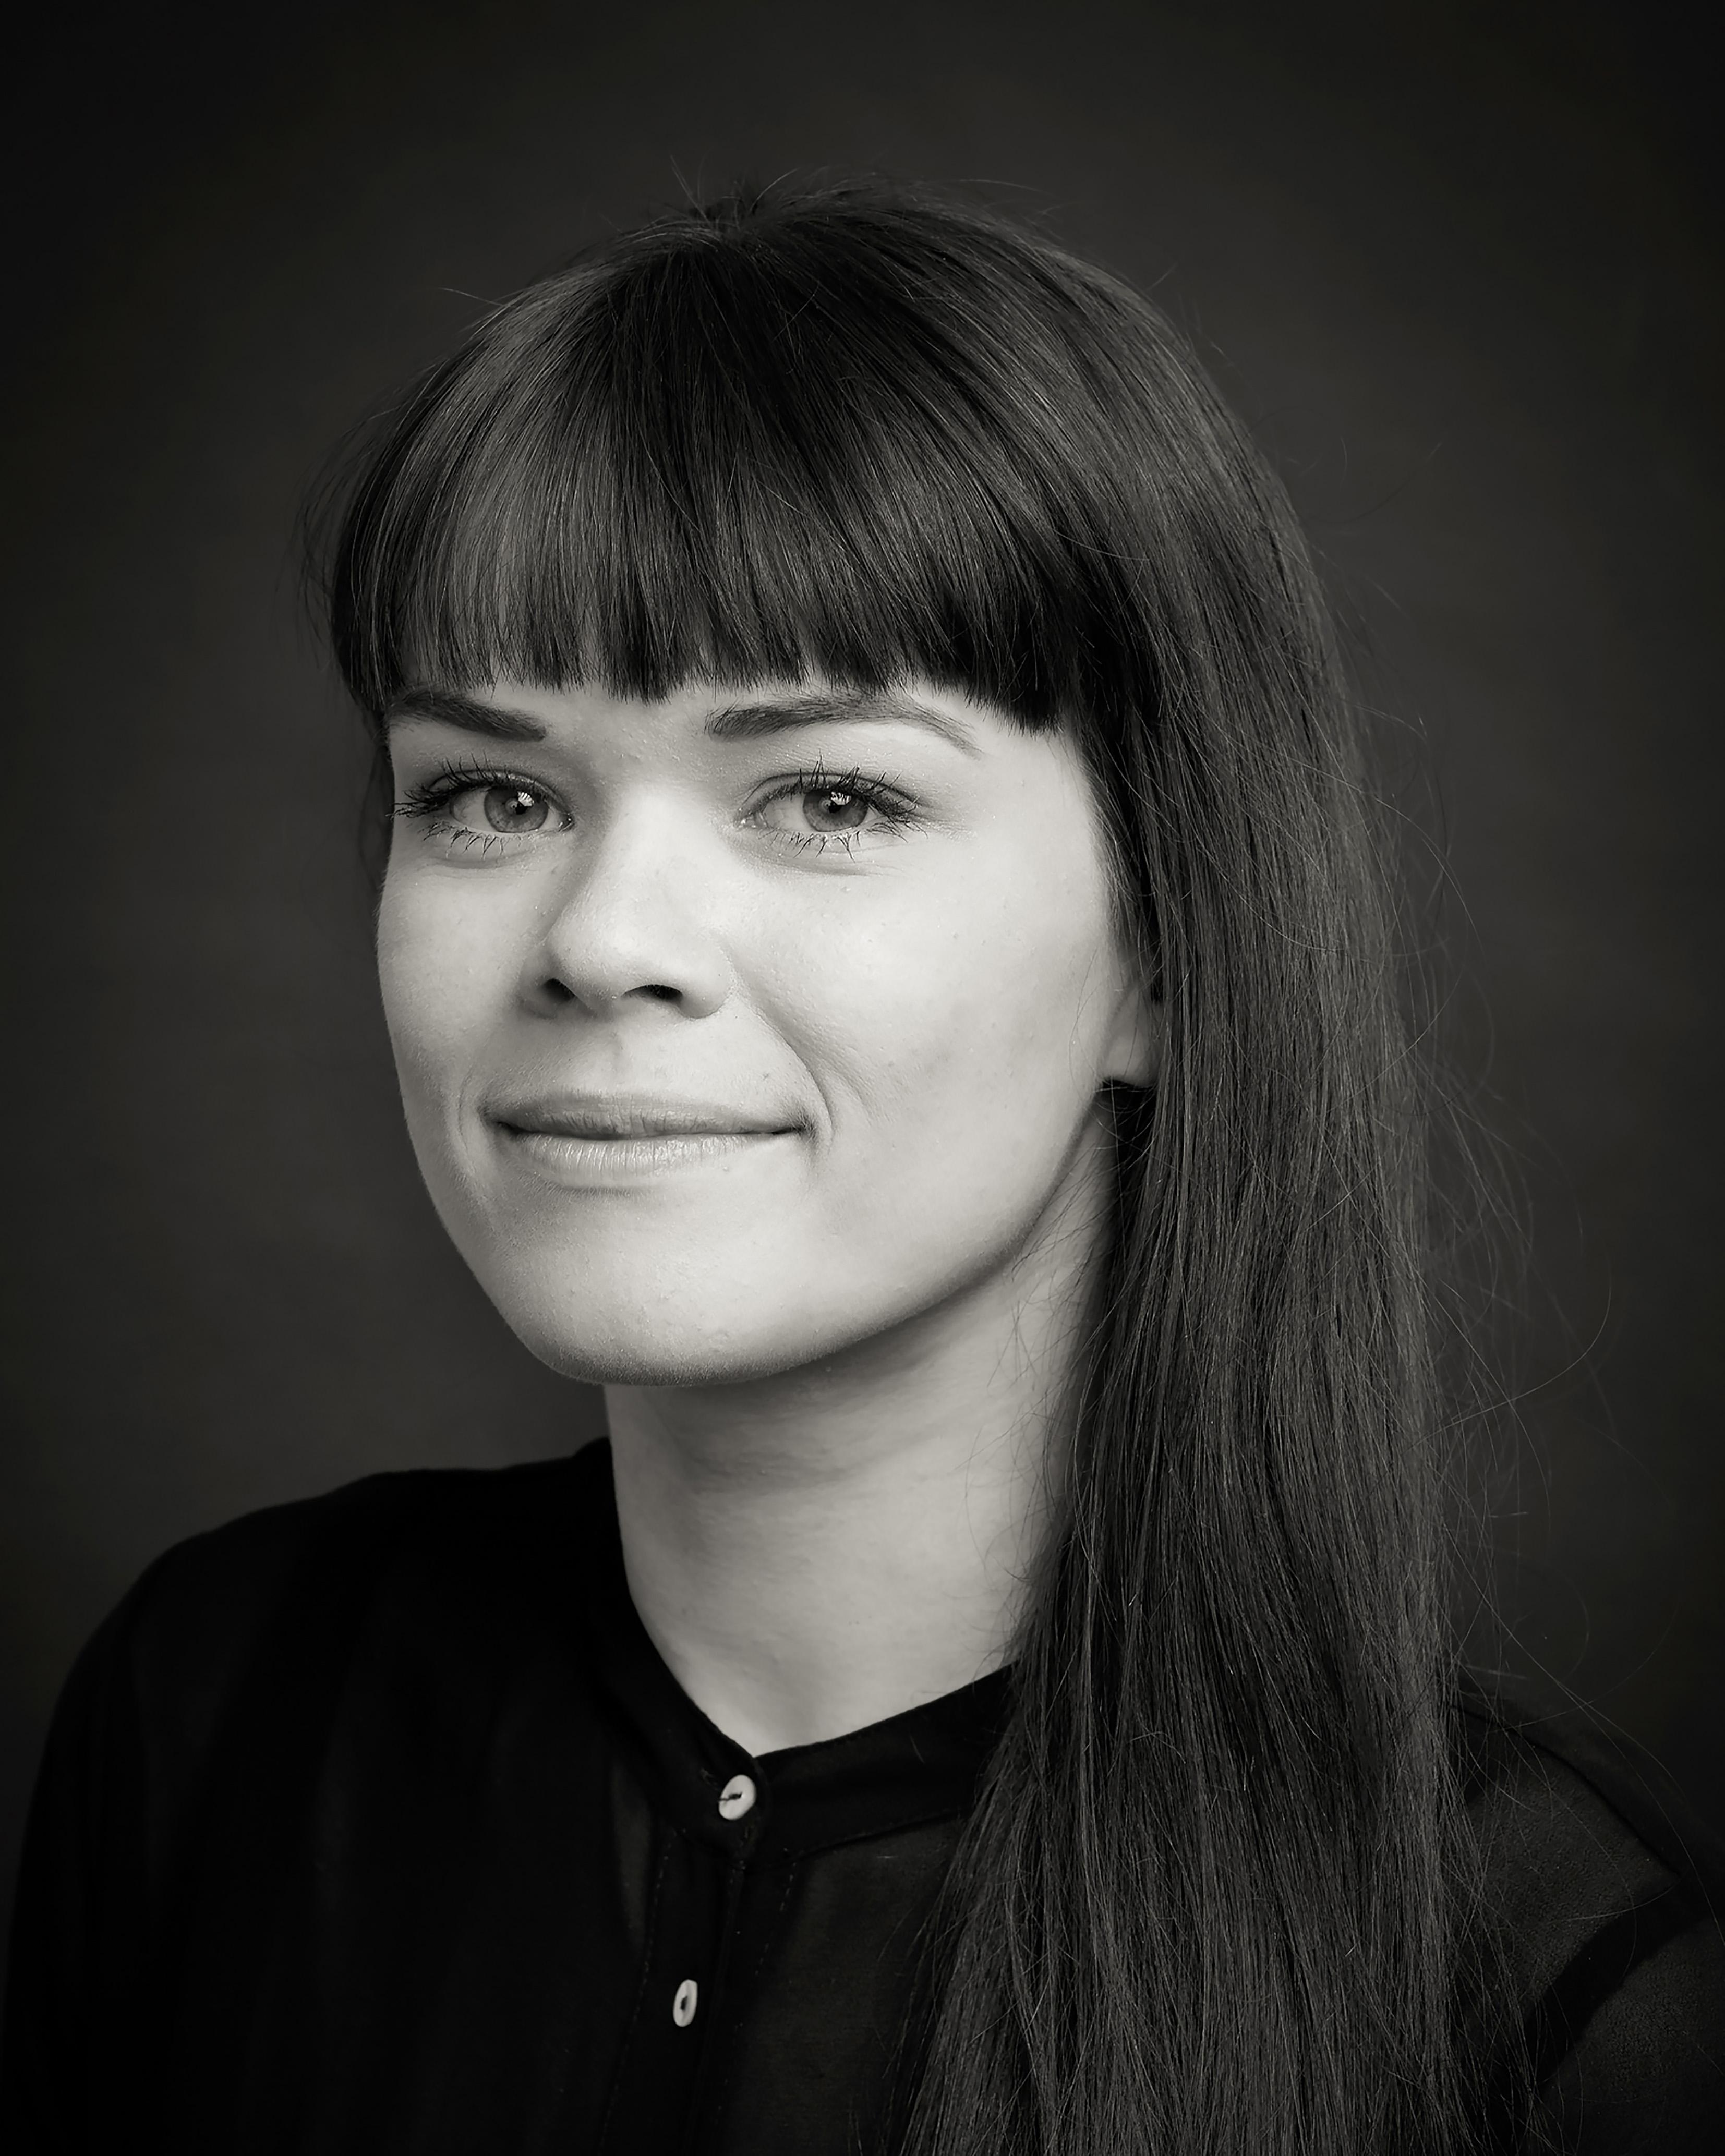 Stina Stjernkvist